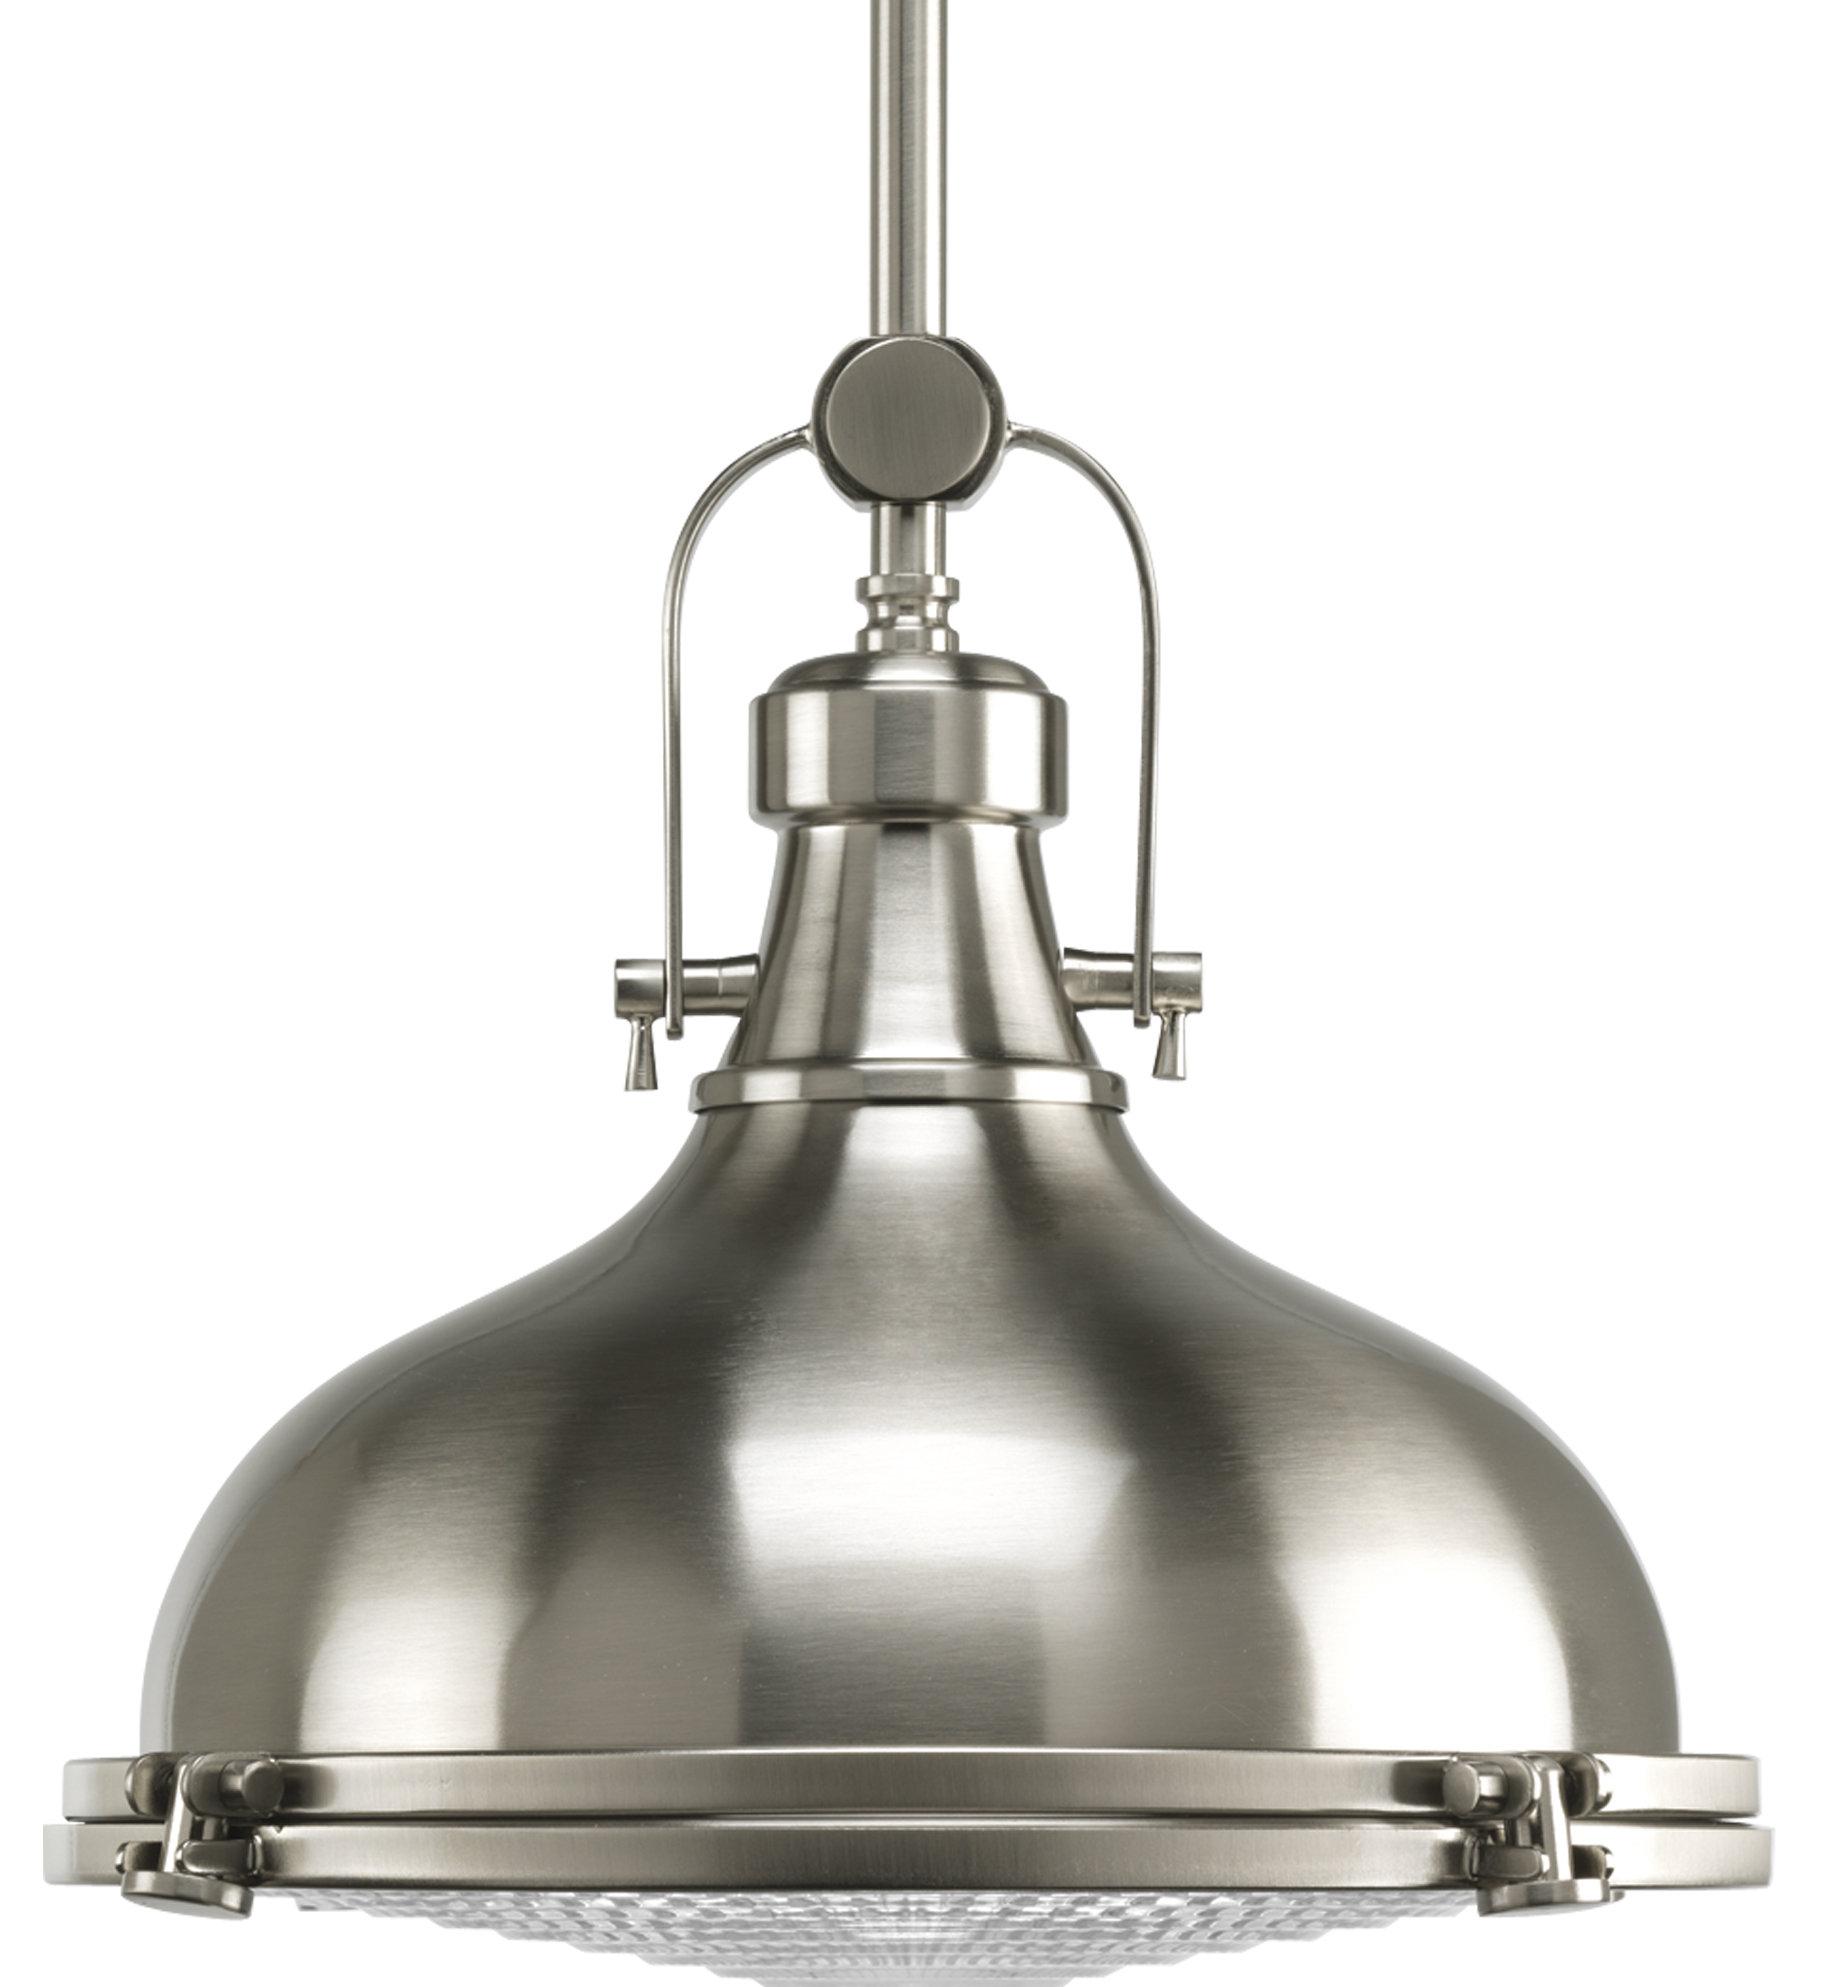 Freeda 1-Light Single Dome Pendant intended for Southlake 1-Light Single Dome Pendants (Image 14 of 30)